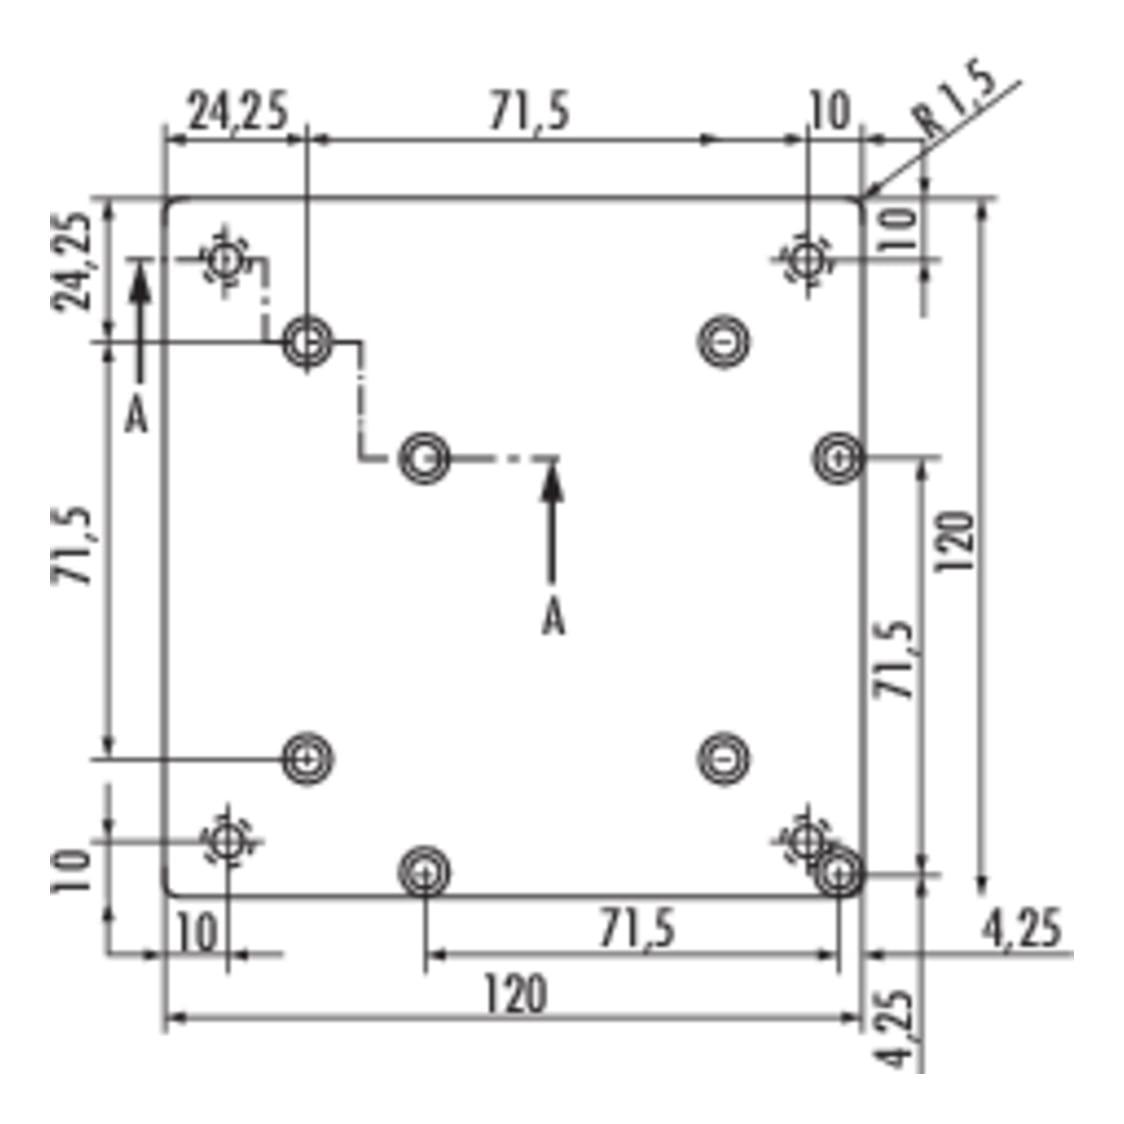 Rhodos 2, Console., roestvrij staalkleurig, H 170 mm, 1 stopcontact